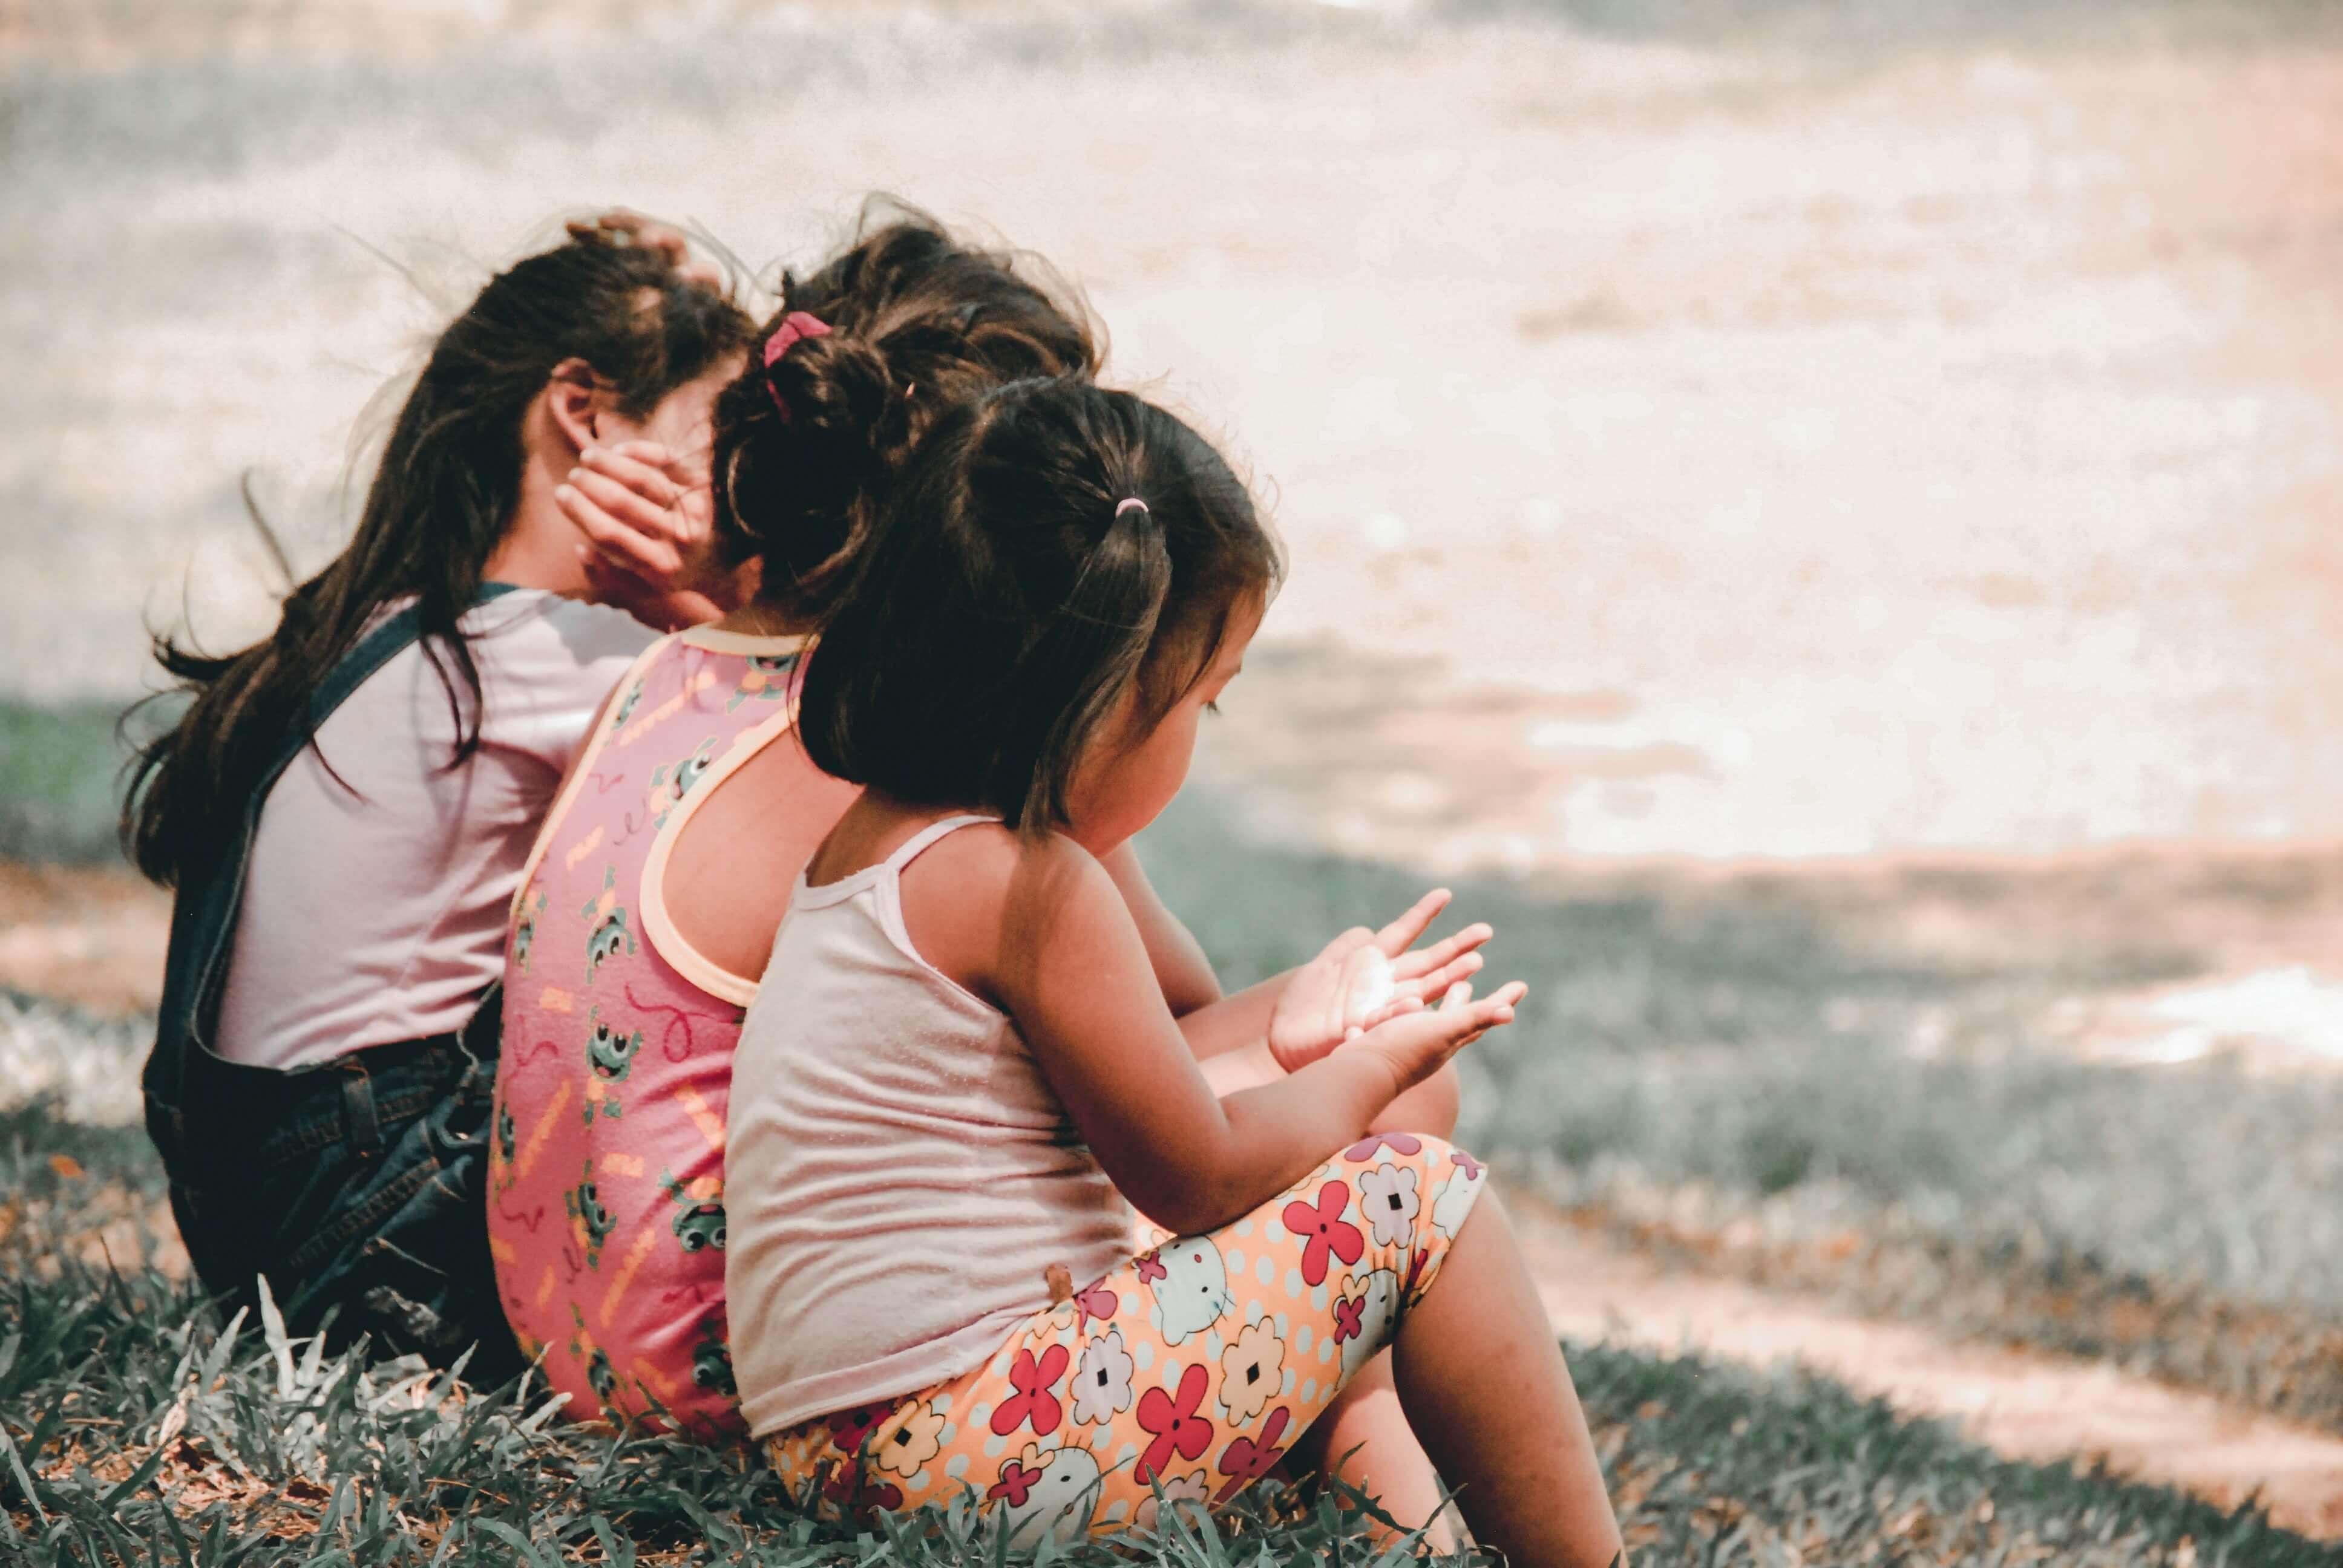 SuperSonic Radio - 7 lucruri pe care le fac copiii cu psihic puternic